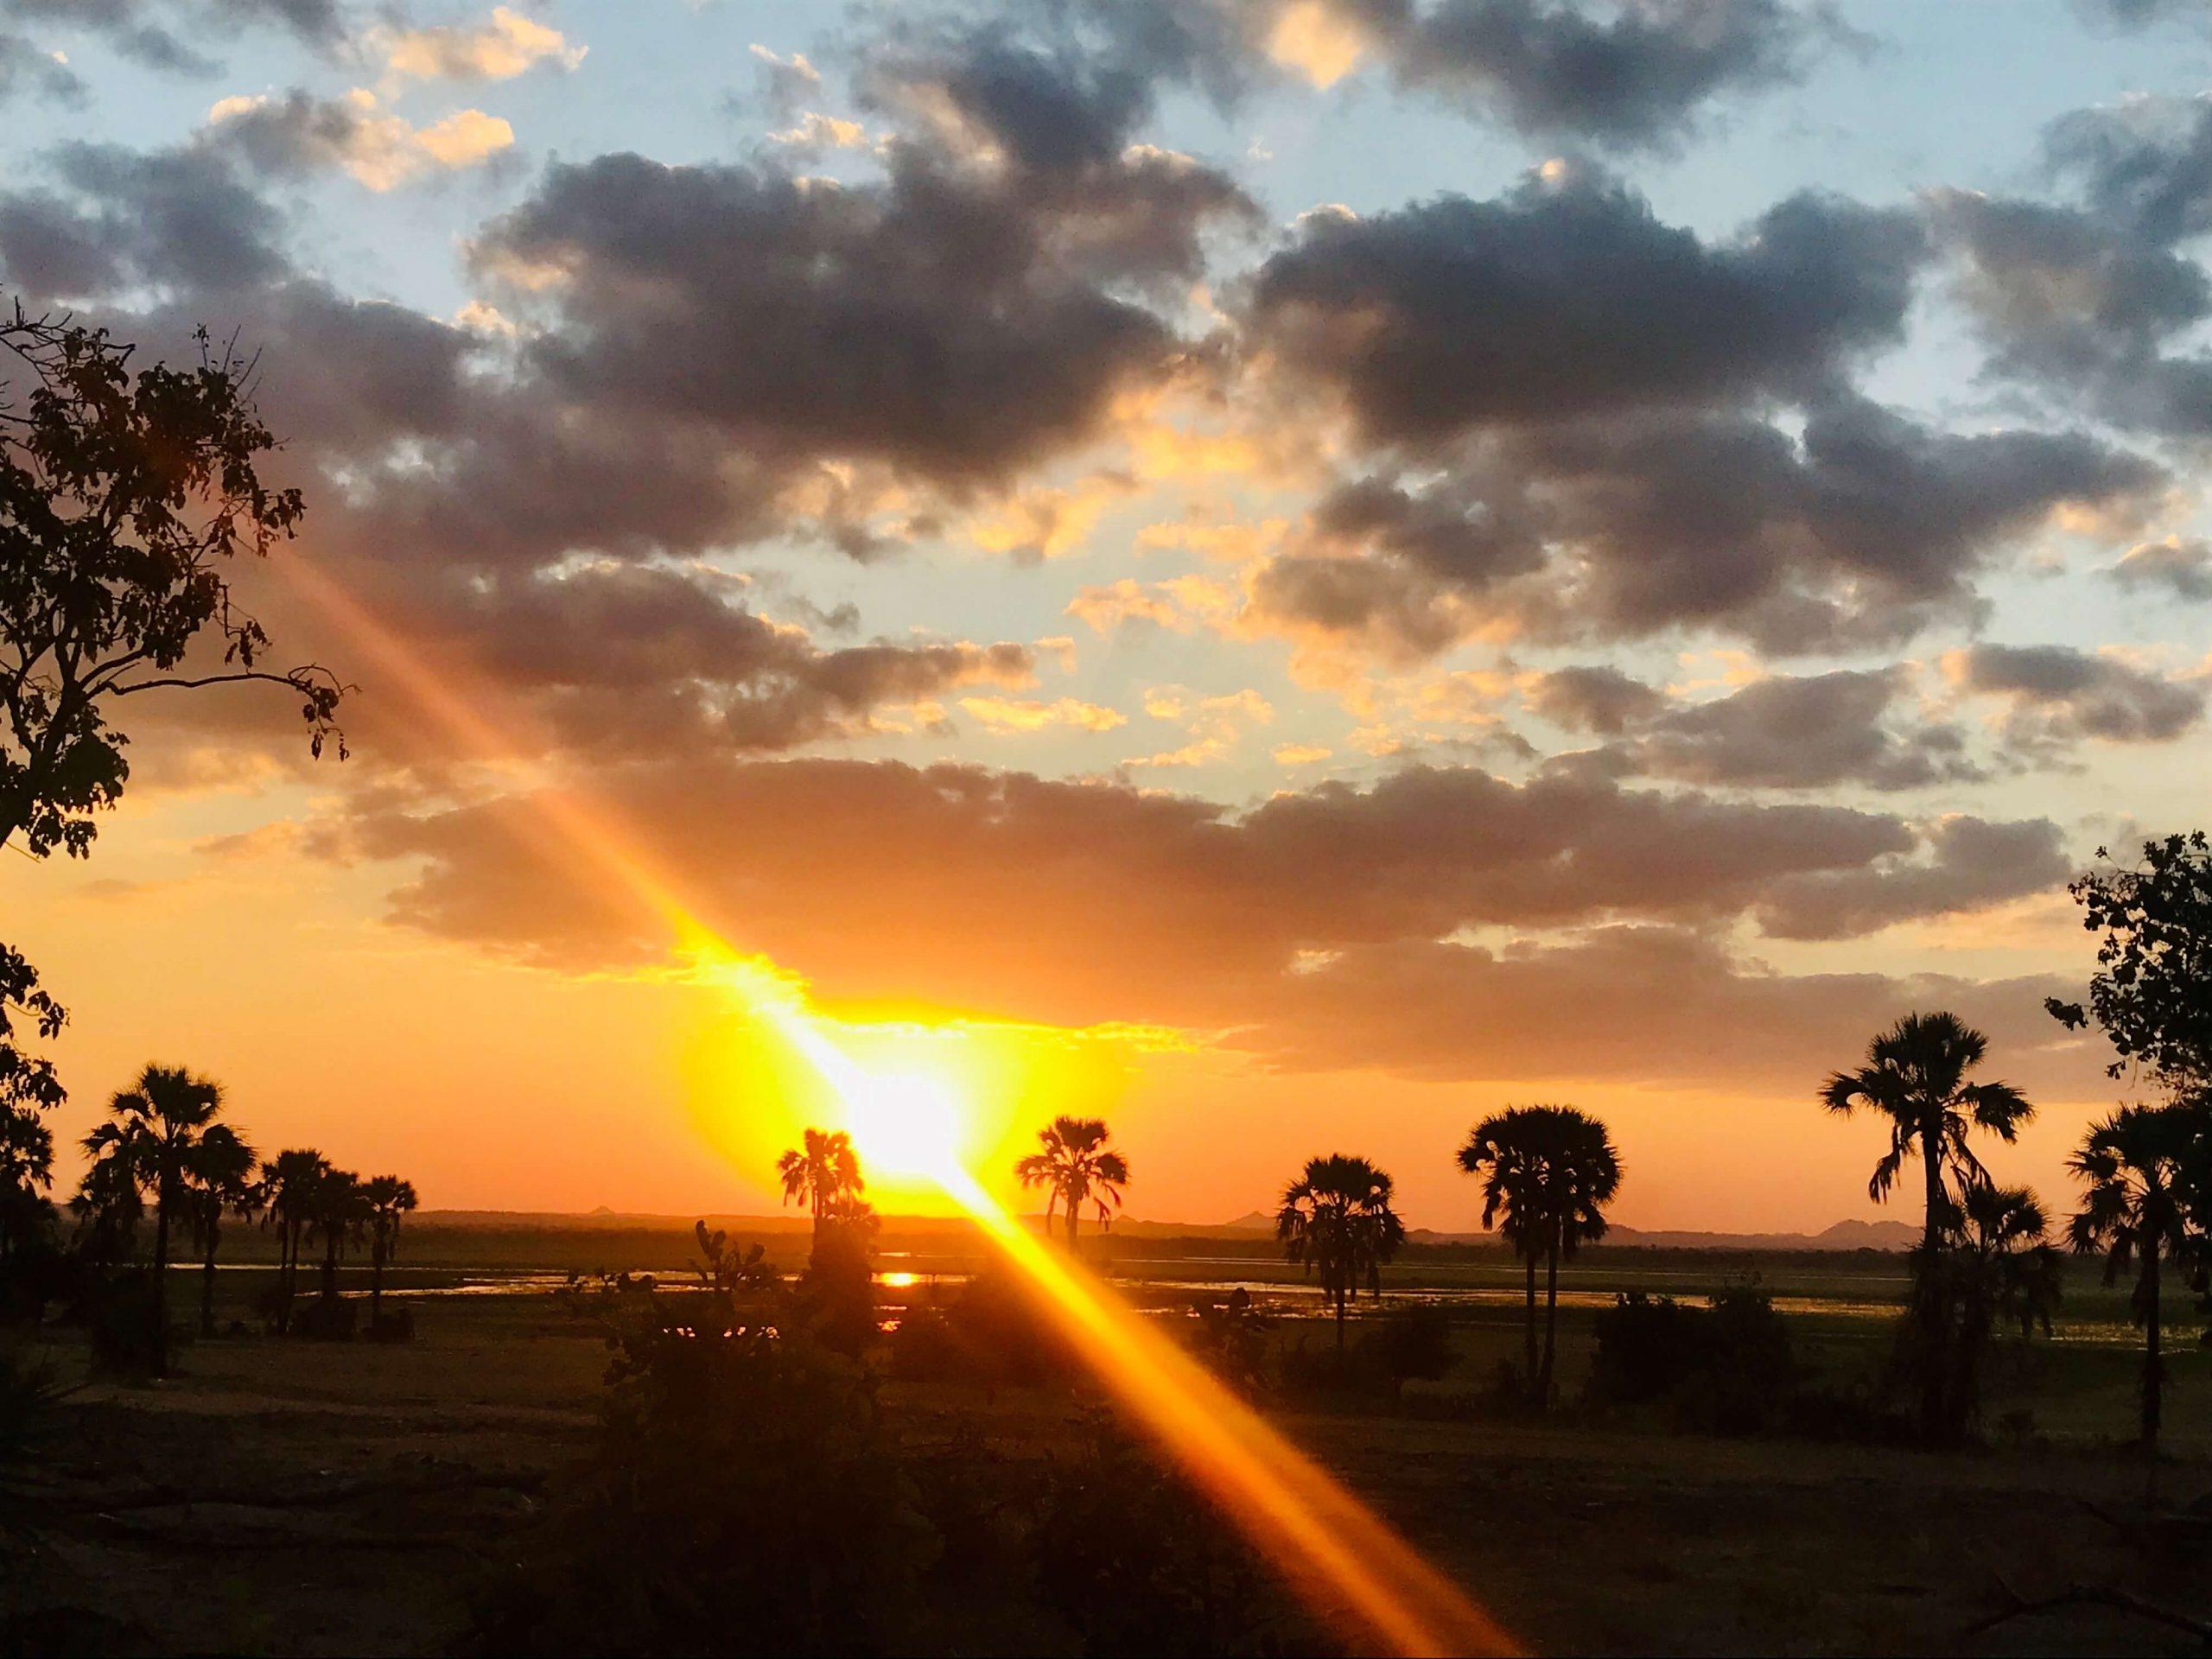 Sunset on safari in Liwonde National Park